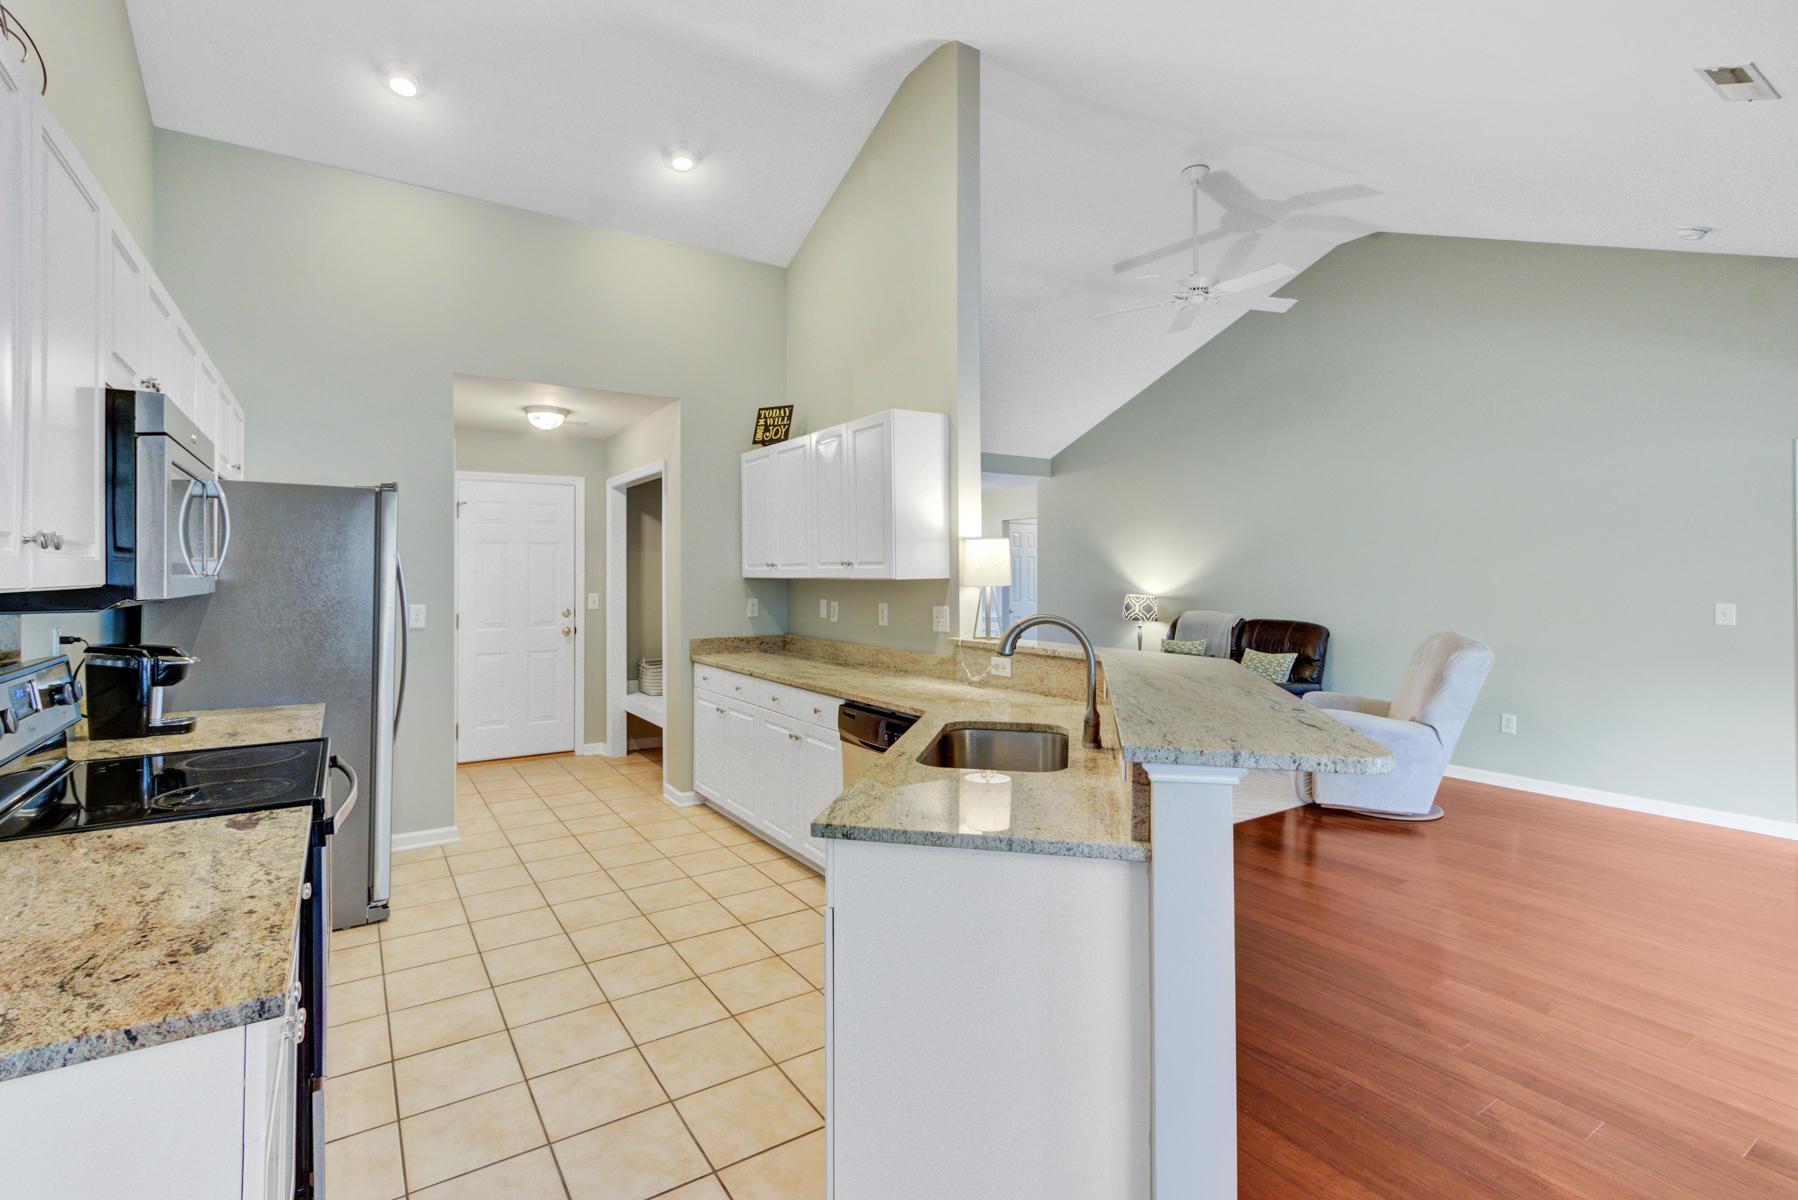 Park West Homes For Sale - 3444 Wellesley, Mount Pleasant, SC - 19